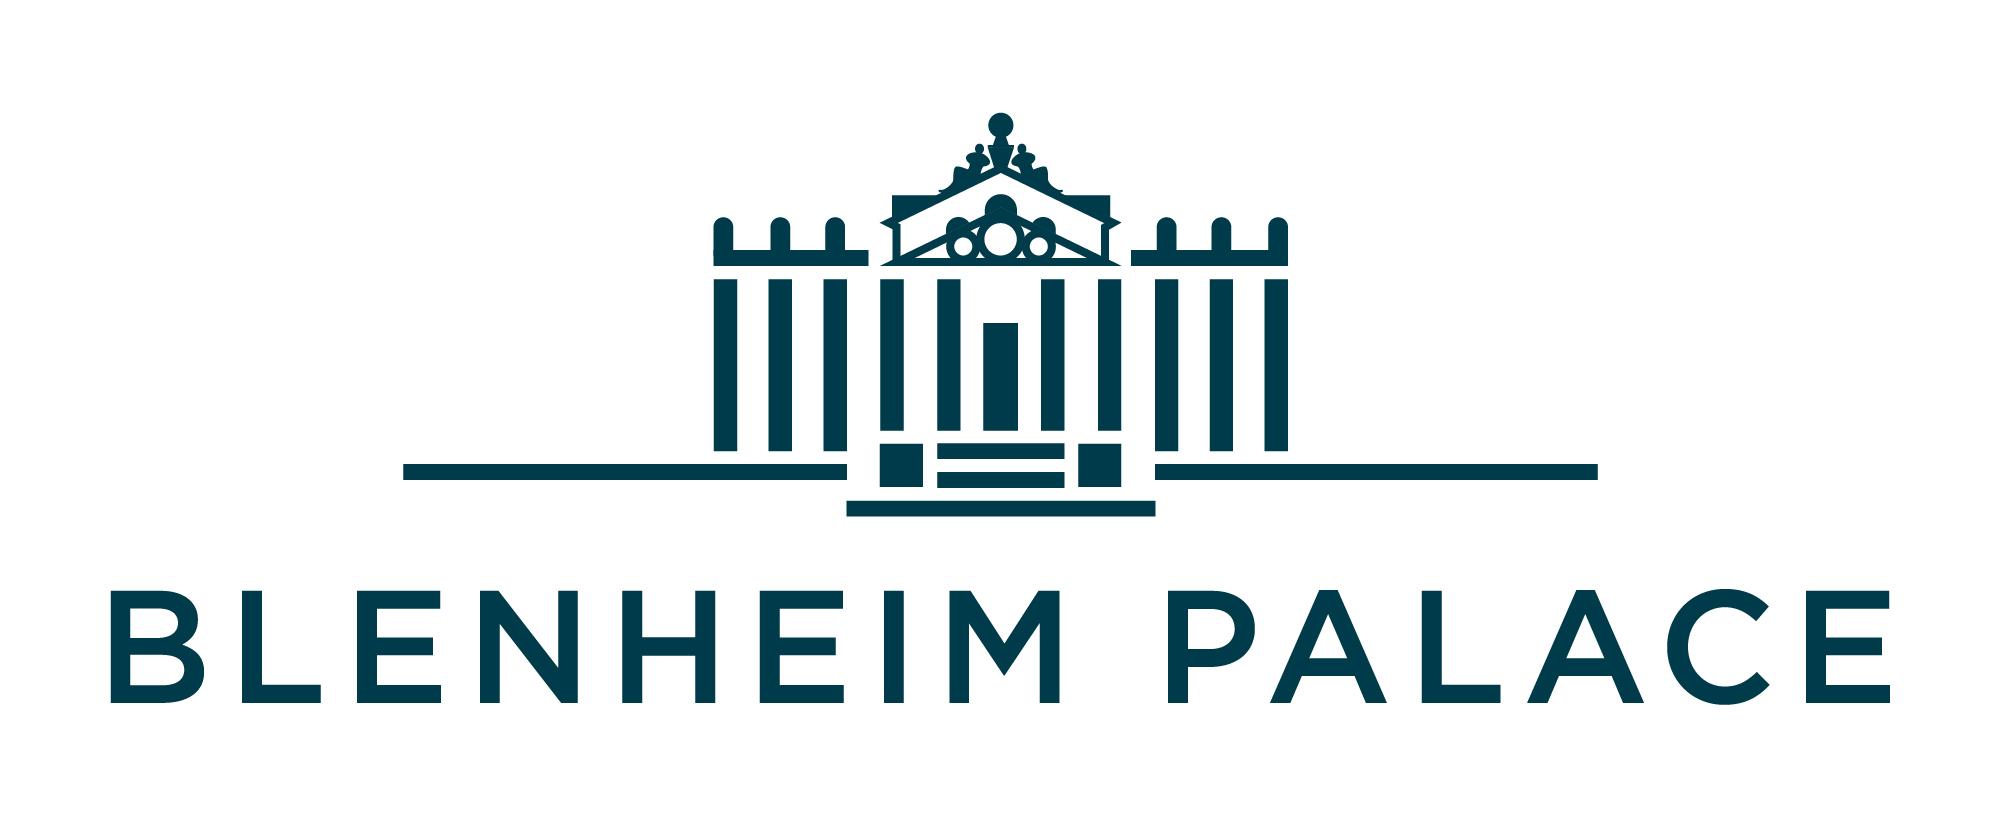 Blenheim Palace New